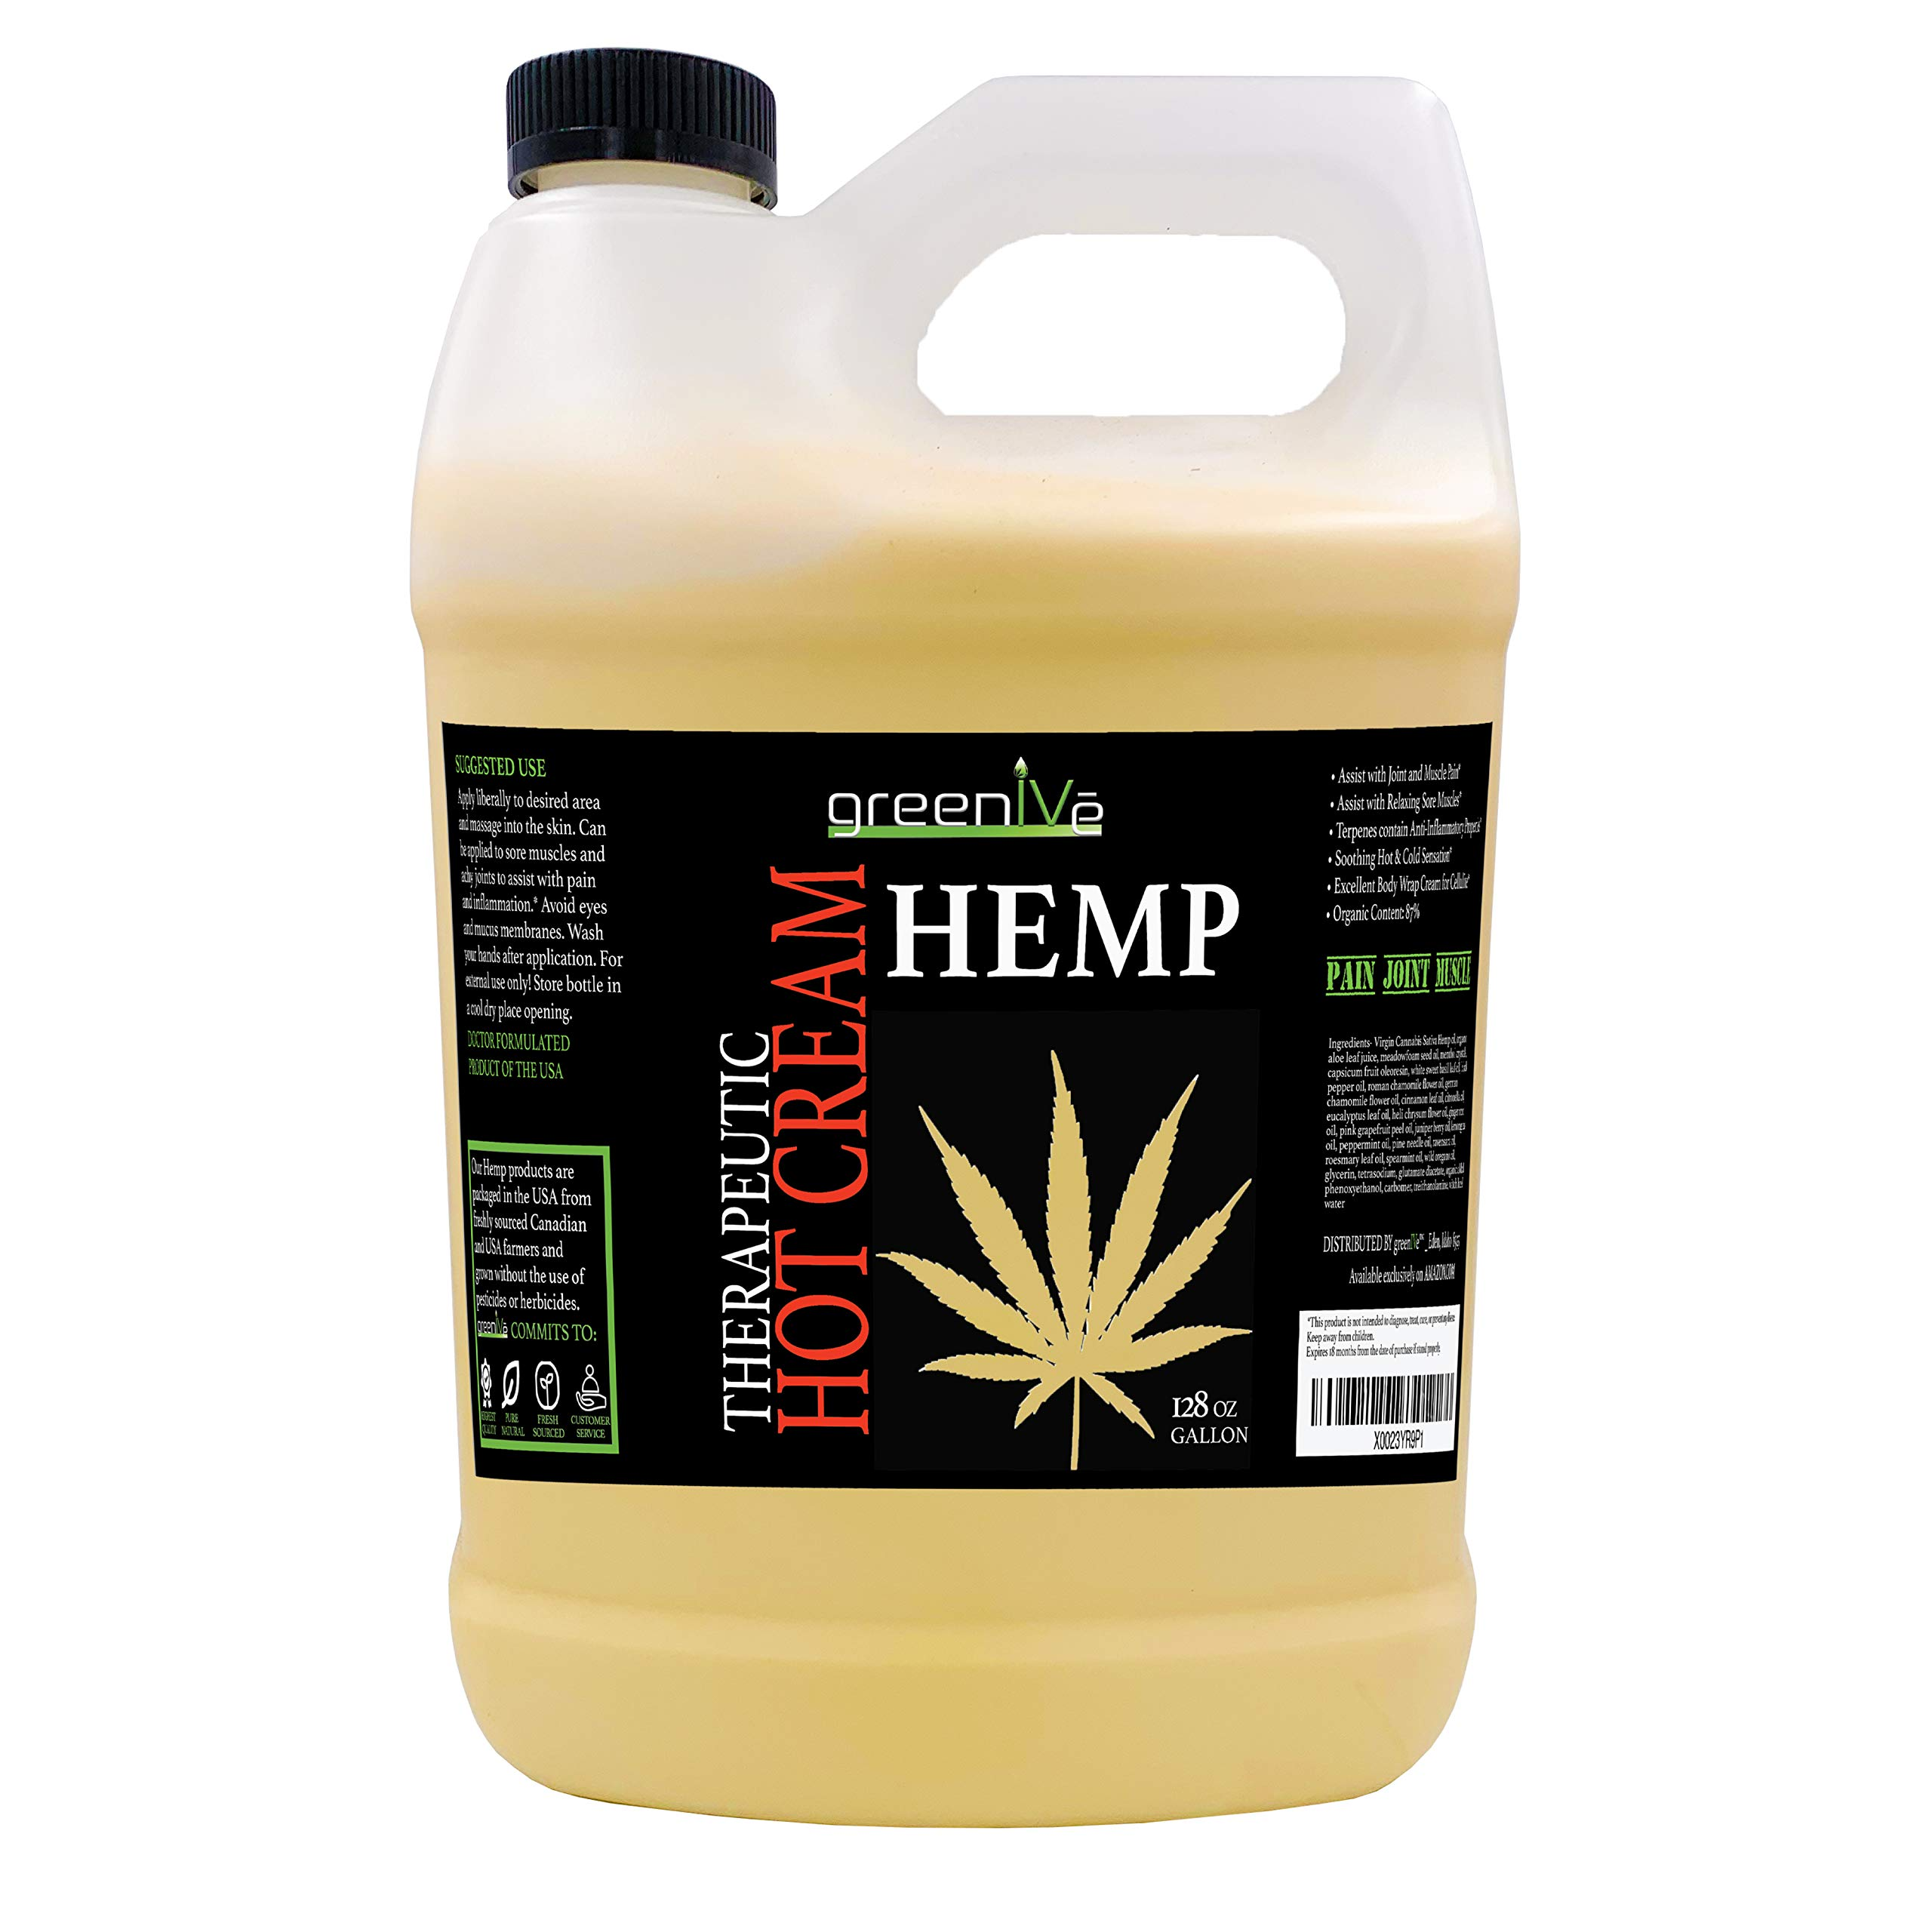 GreenIVe Hemp Hot Cream Soothing Moisturizing Hemp Hot Cream Exclusively on Amazon (128 oz (1 Gallon))